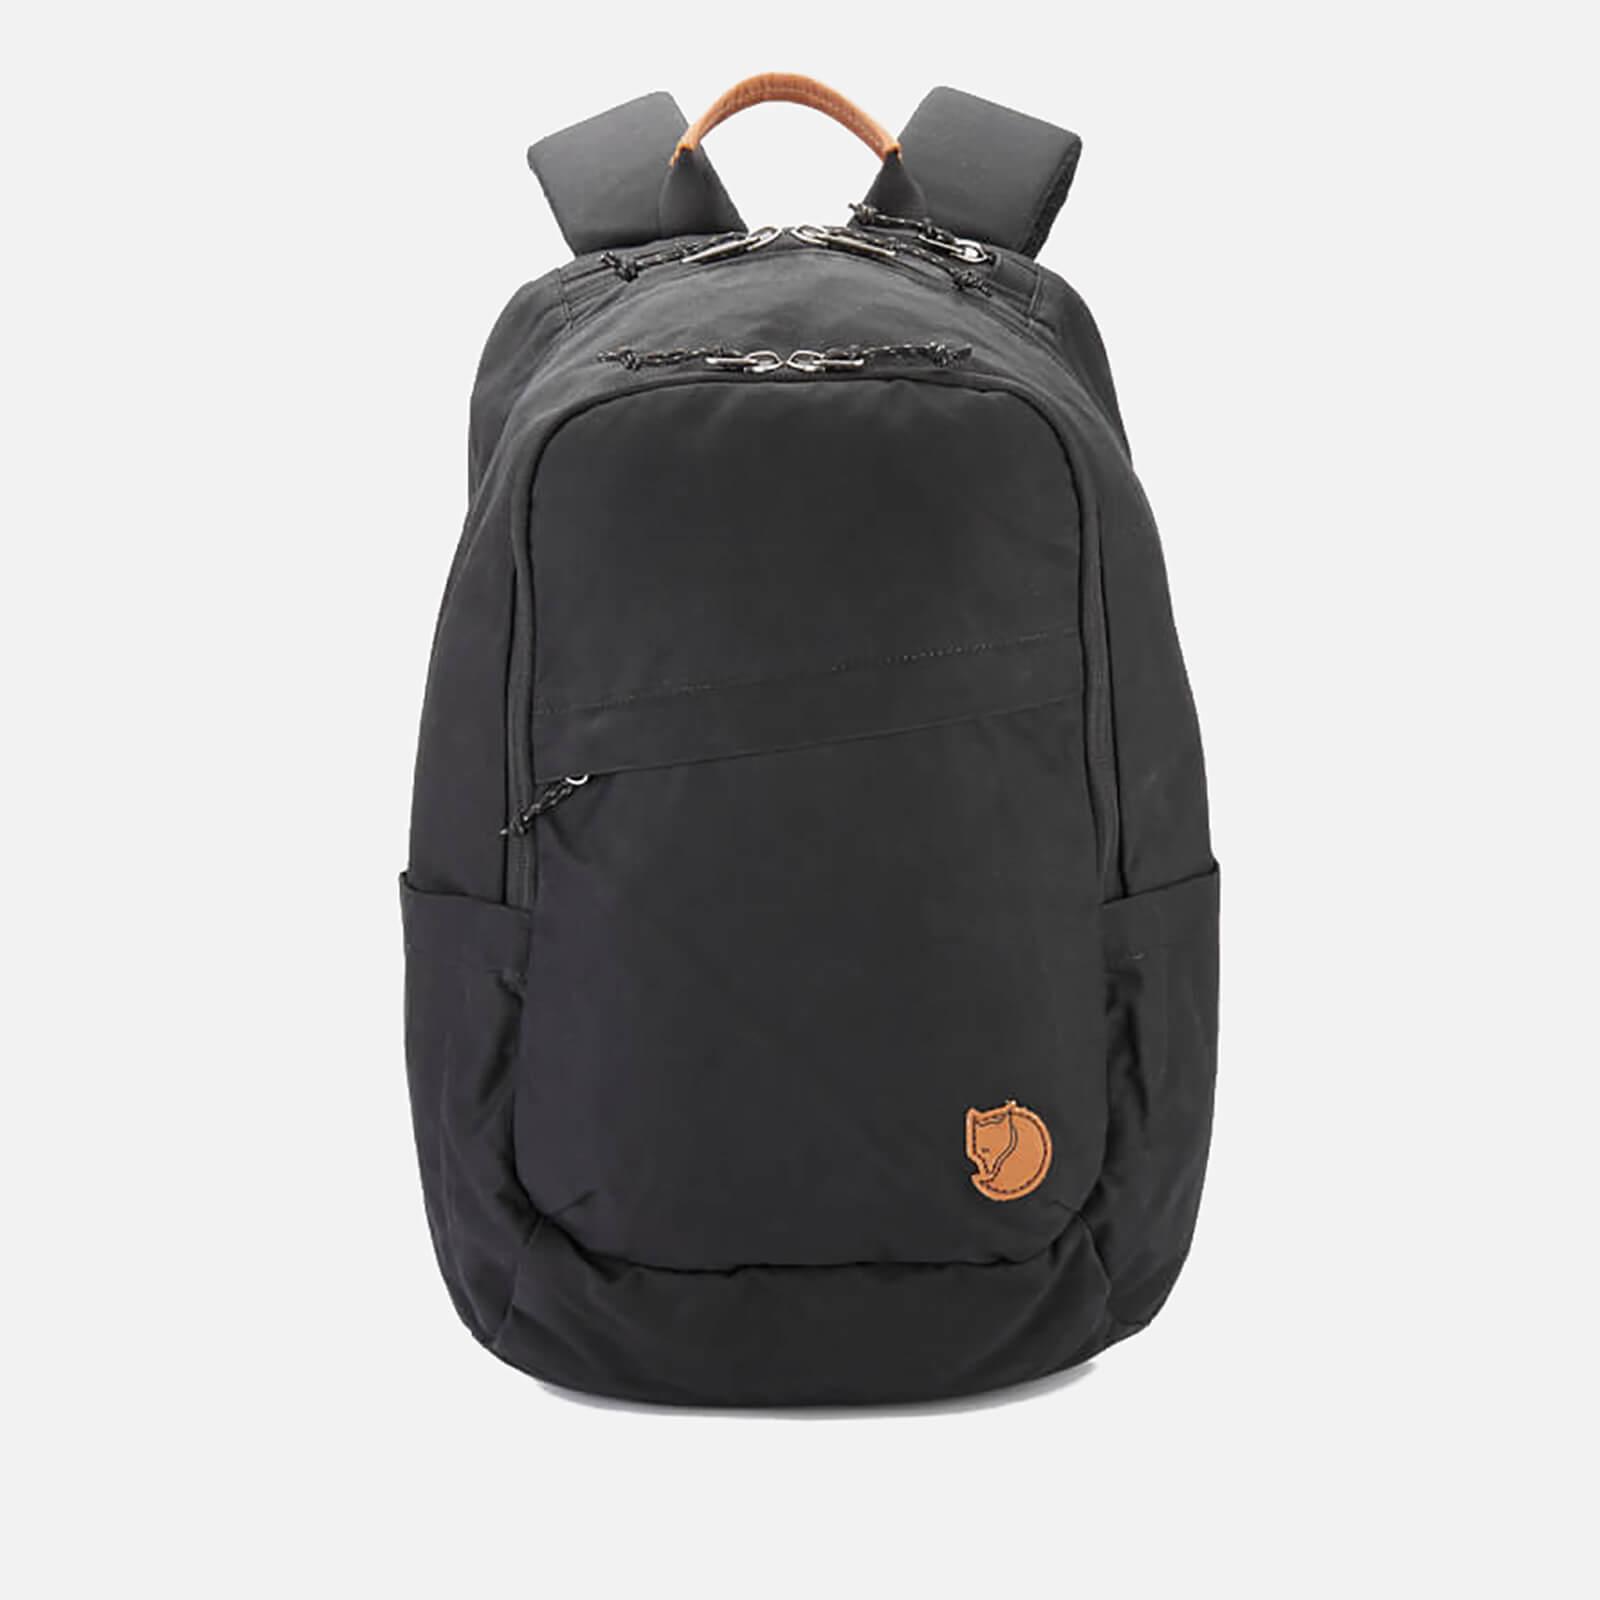 df645b4d8 Fjallraven Raven 20l Backpack Black Free Uk ...